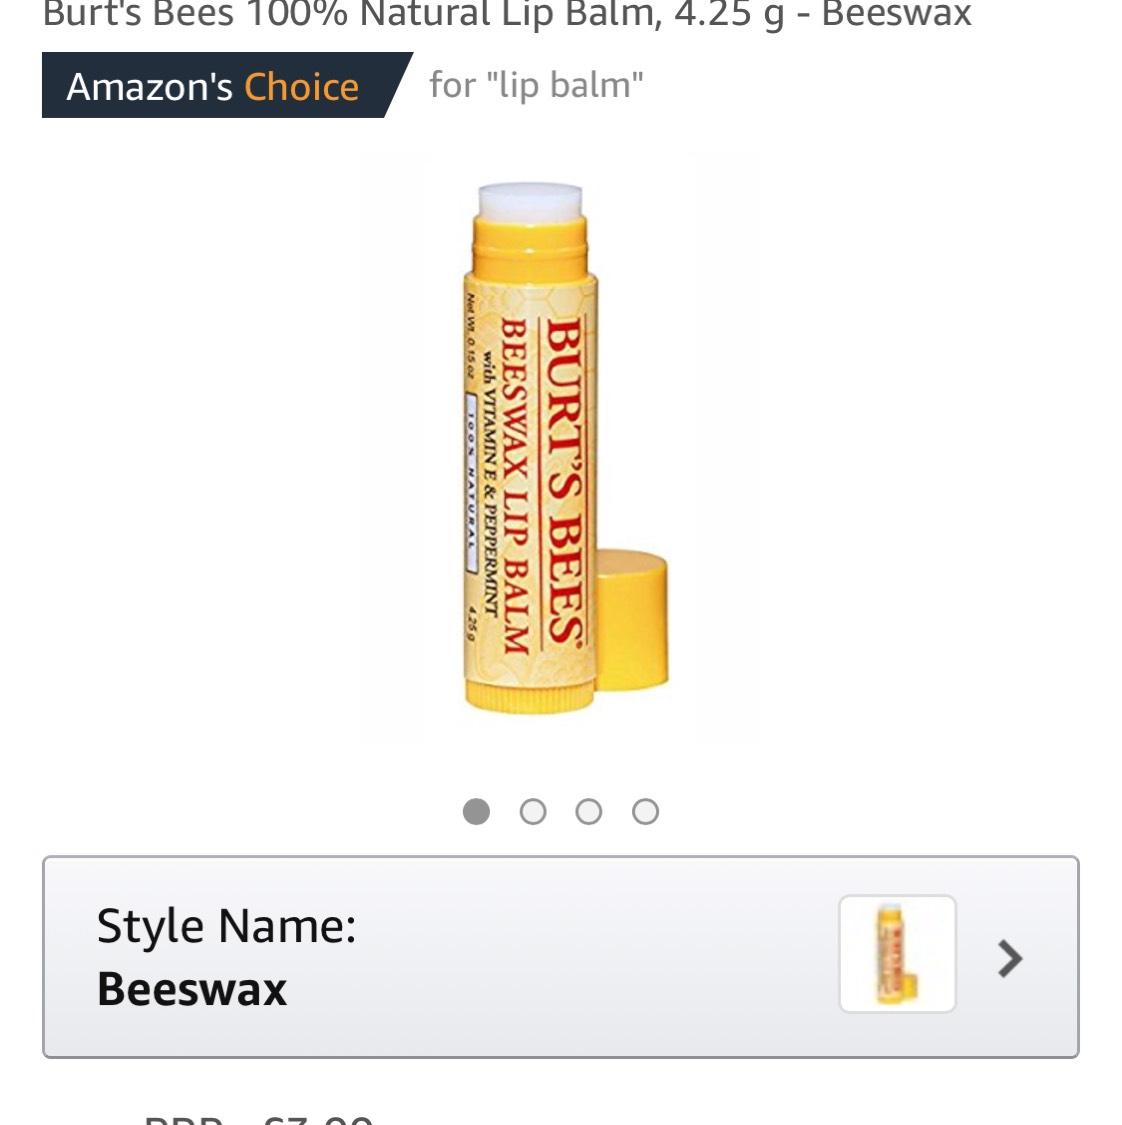 Burt's Bees 100% Natural Lip Balm, 4.25 g - Beeswax £2.65 Prime / £6.64 Non Prime / £2.52 S+S @ Amazon